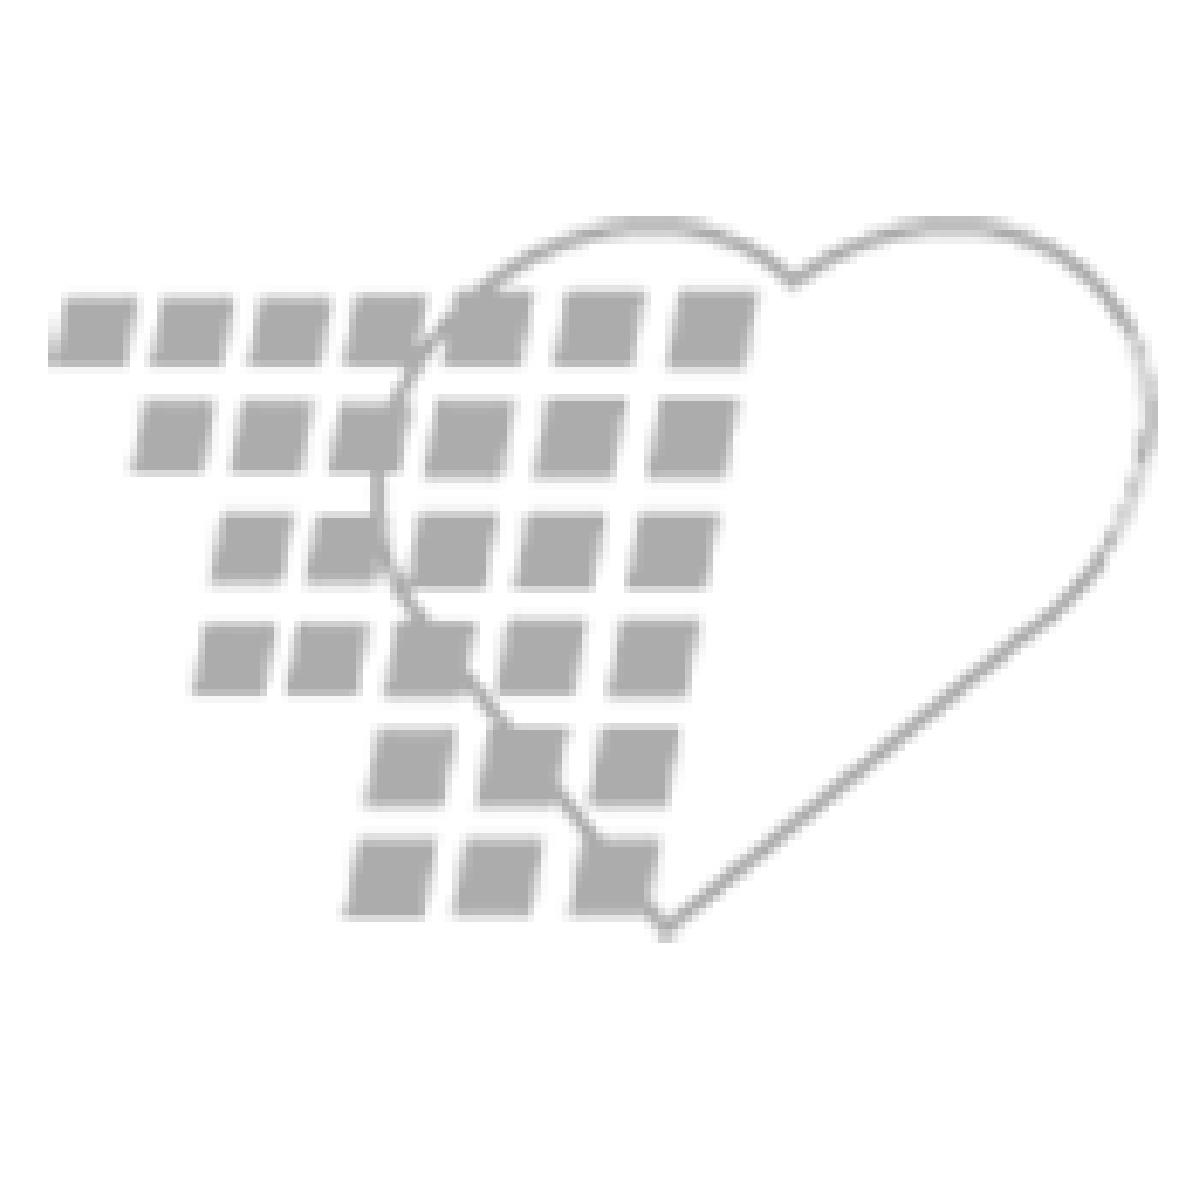 02-92-1211 Baseline® Economy Plastic Skinfold Caliper 8.5 x 0.5 x 3.5 Inch